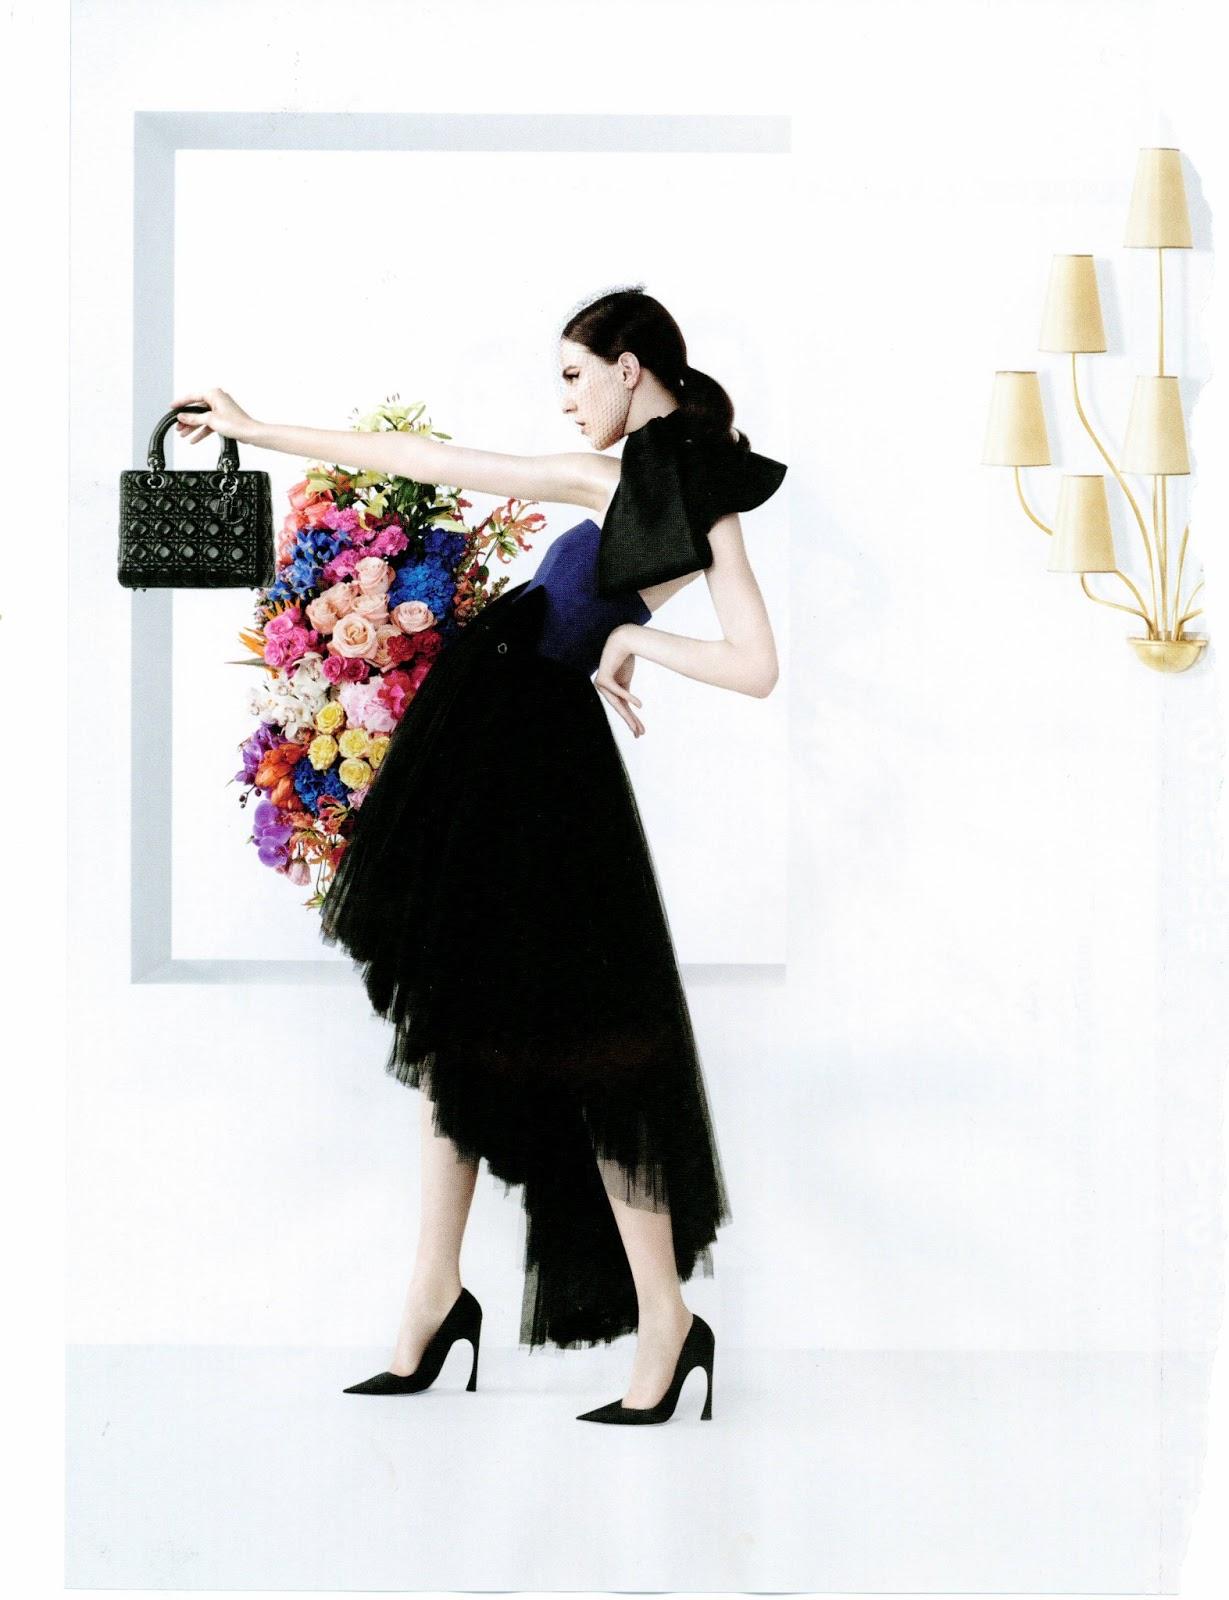 http://4.bp.blogspot.com/-QJnUOoiVZag/UTpAN6U6E8I/AAAAAAAAAT8/0k9eB2bG-qw/s1600/Pal+++Smith_Flower+Power_Dior+1.jpg